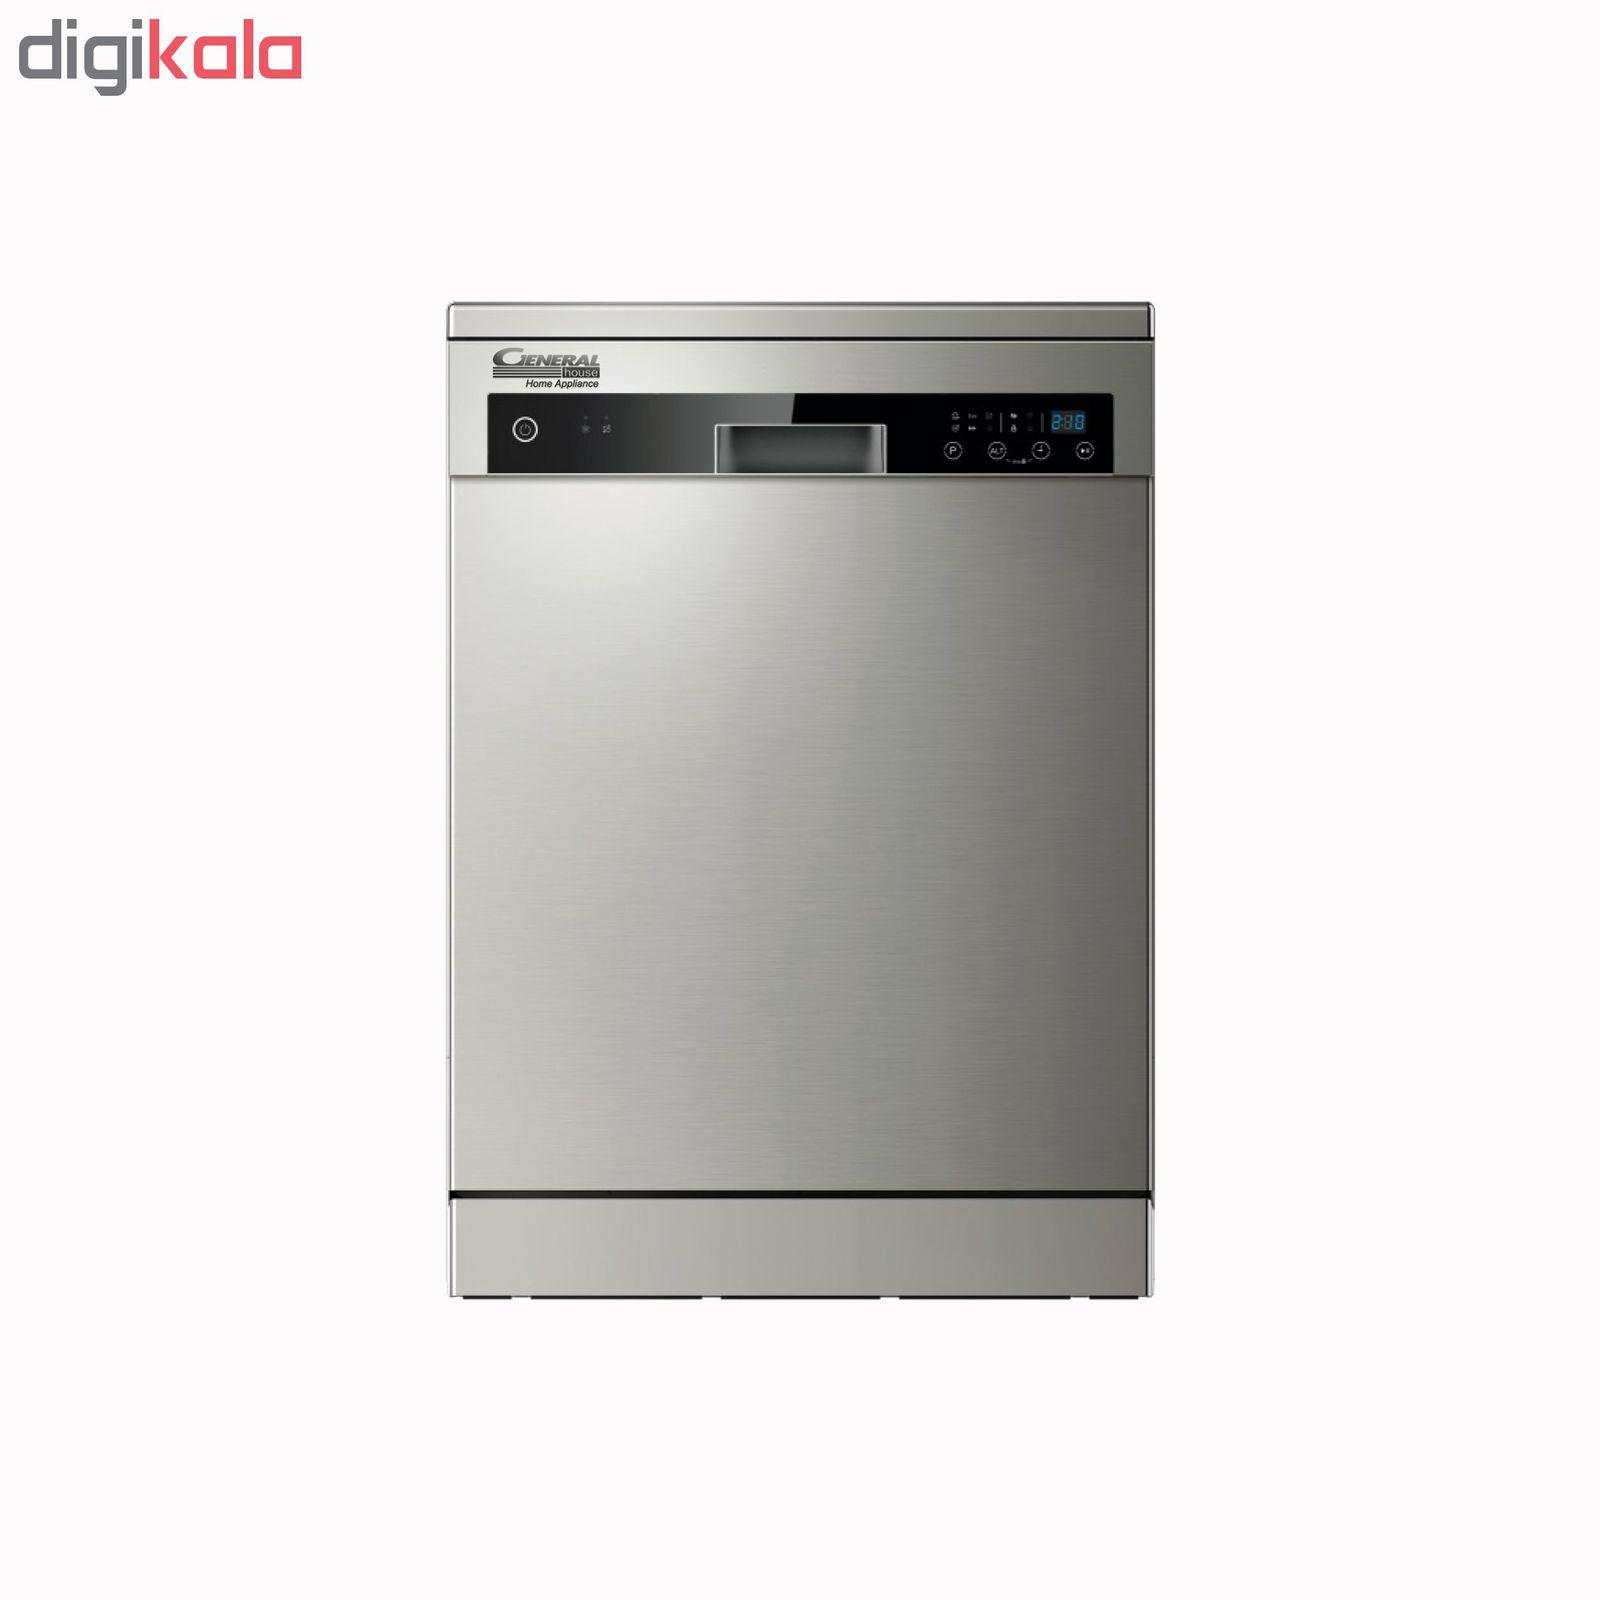 ماشین ظرفشویی جنرال هاوس کد W60